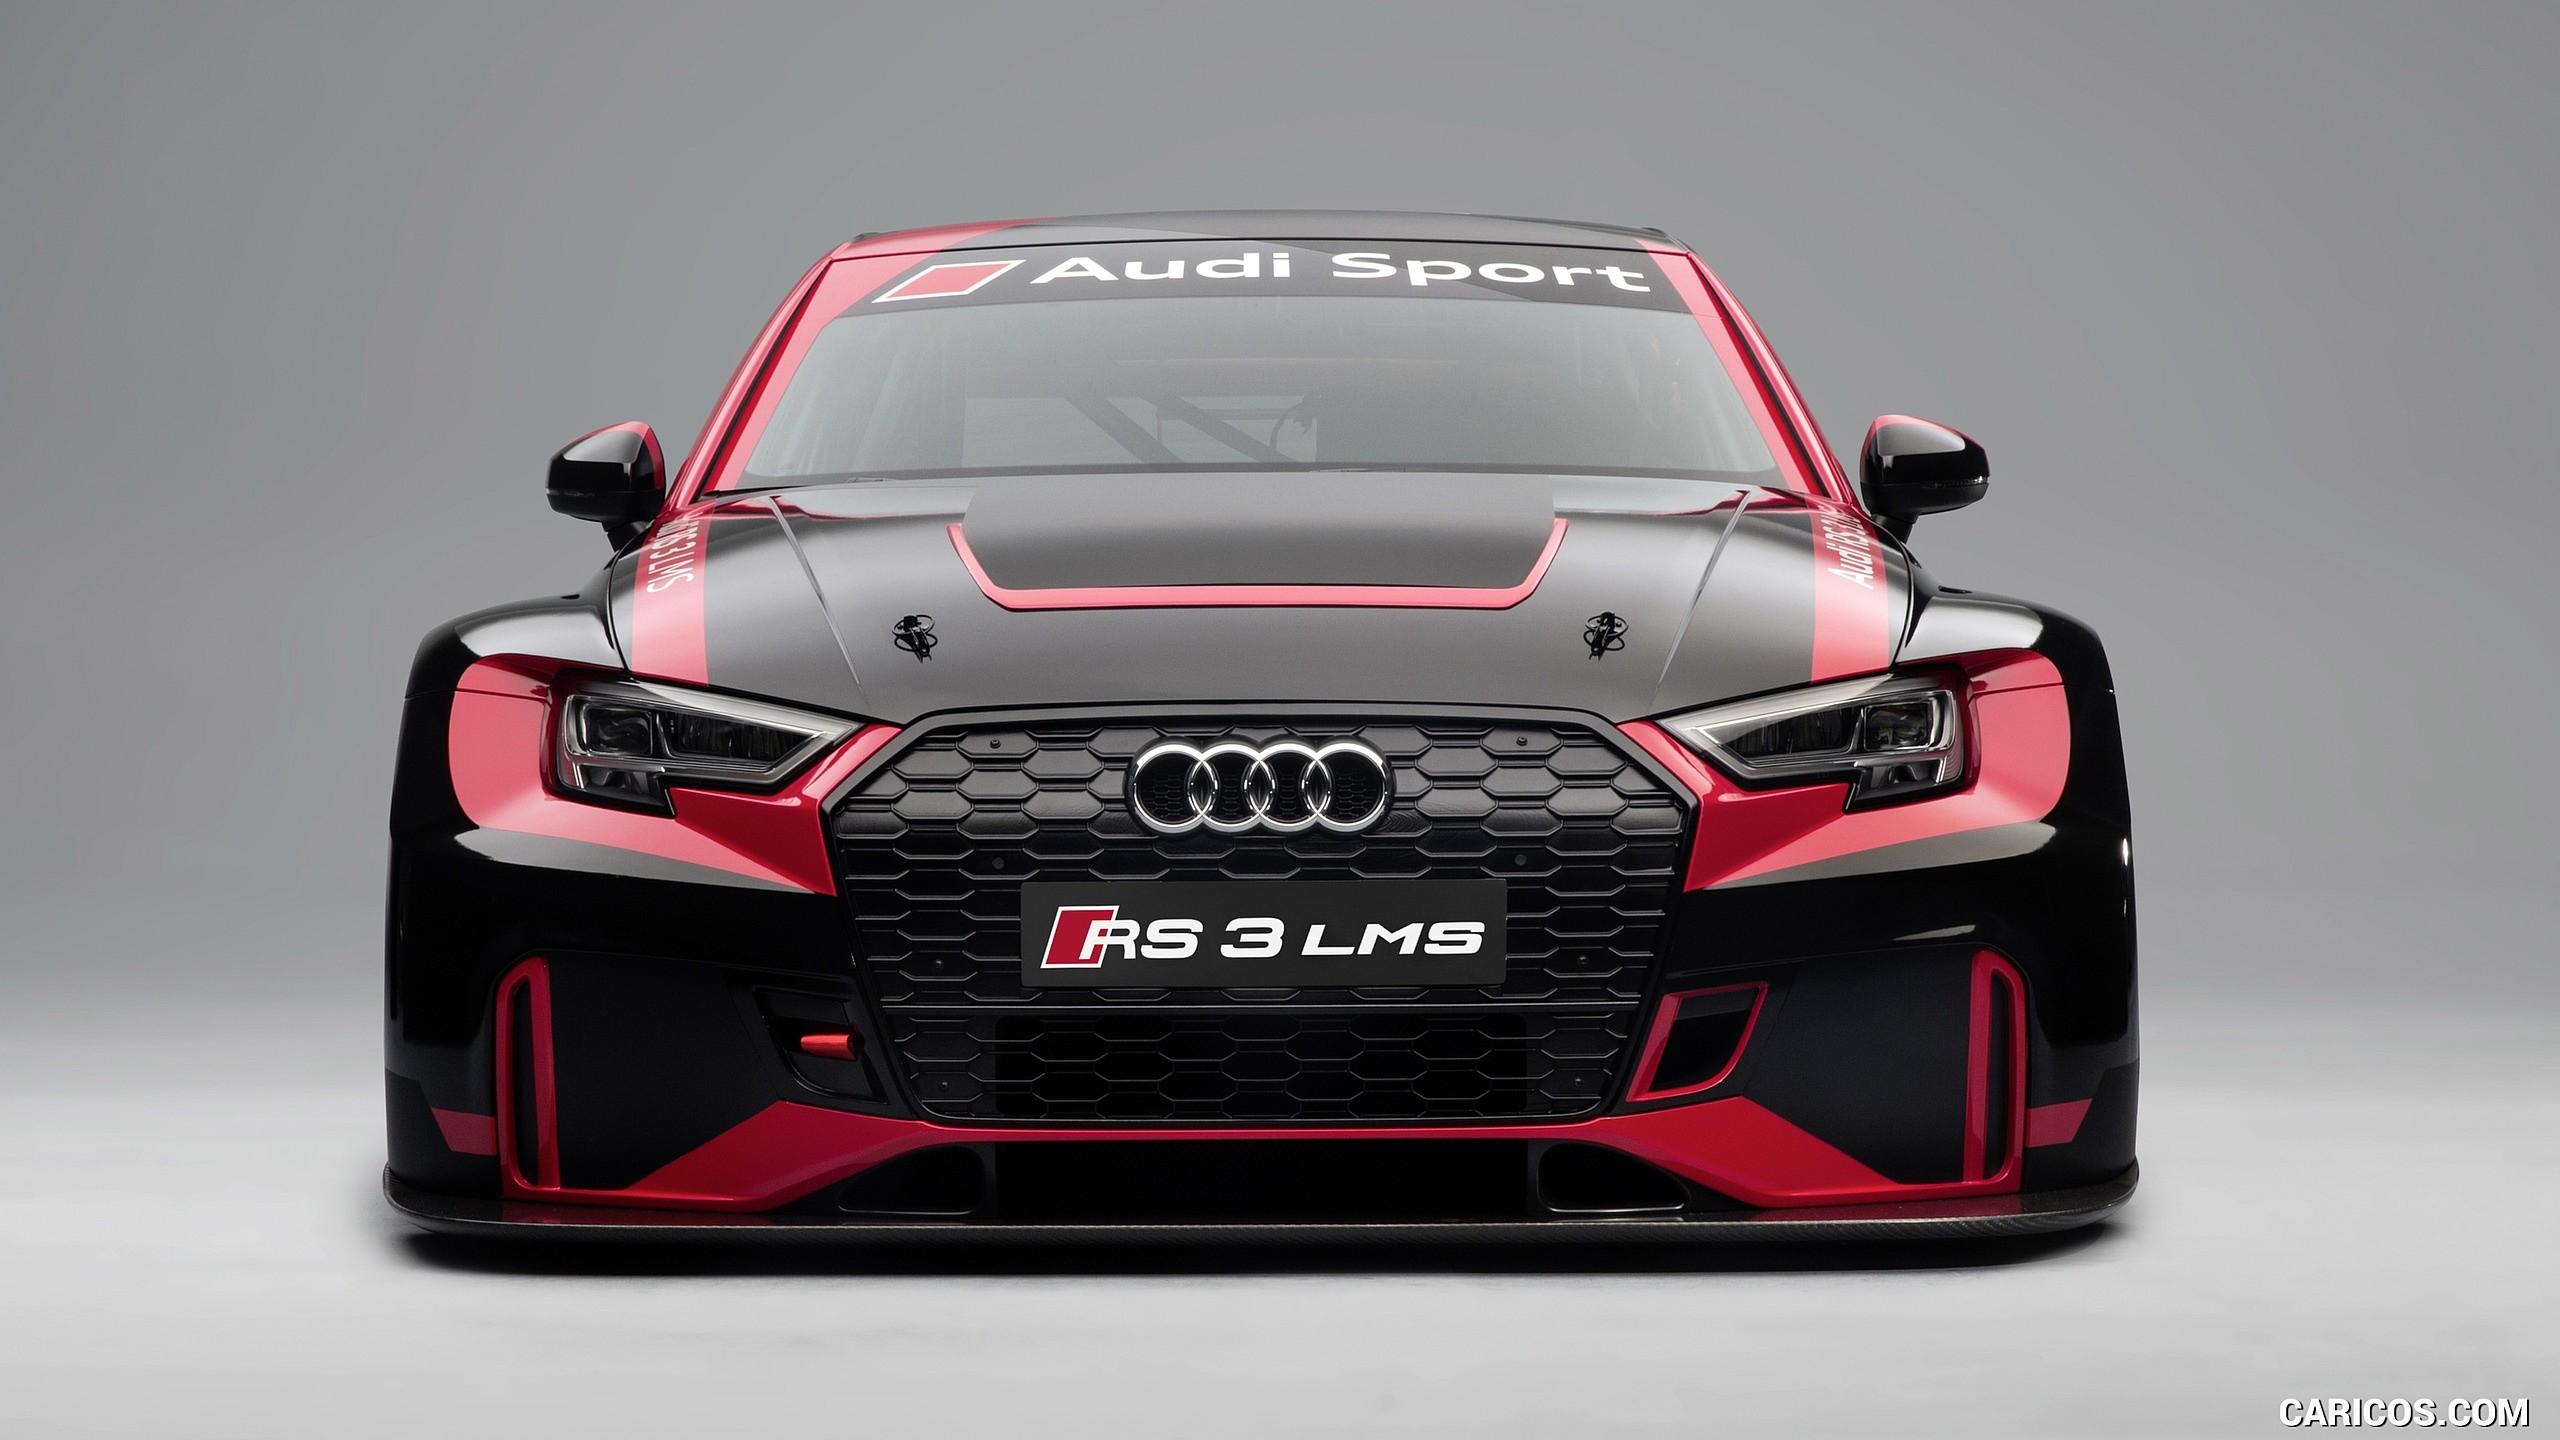 Wallpaper : Audi, sports car, audi rs 3 lms, performance car